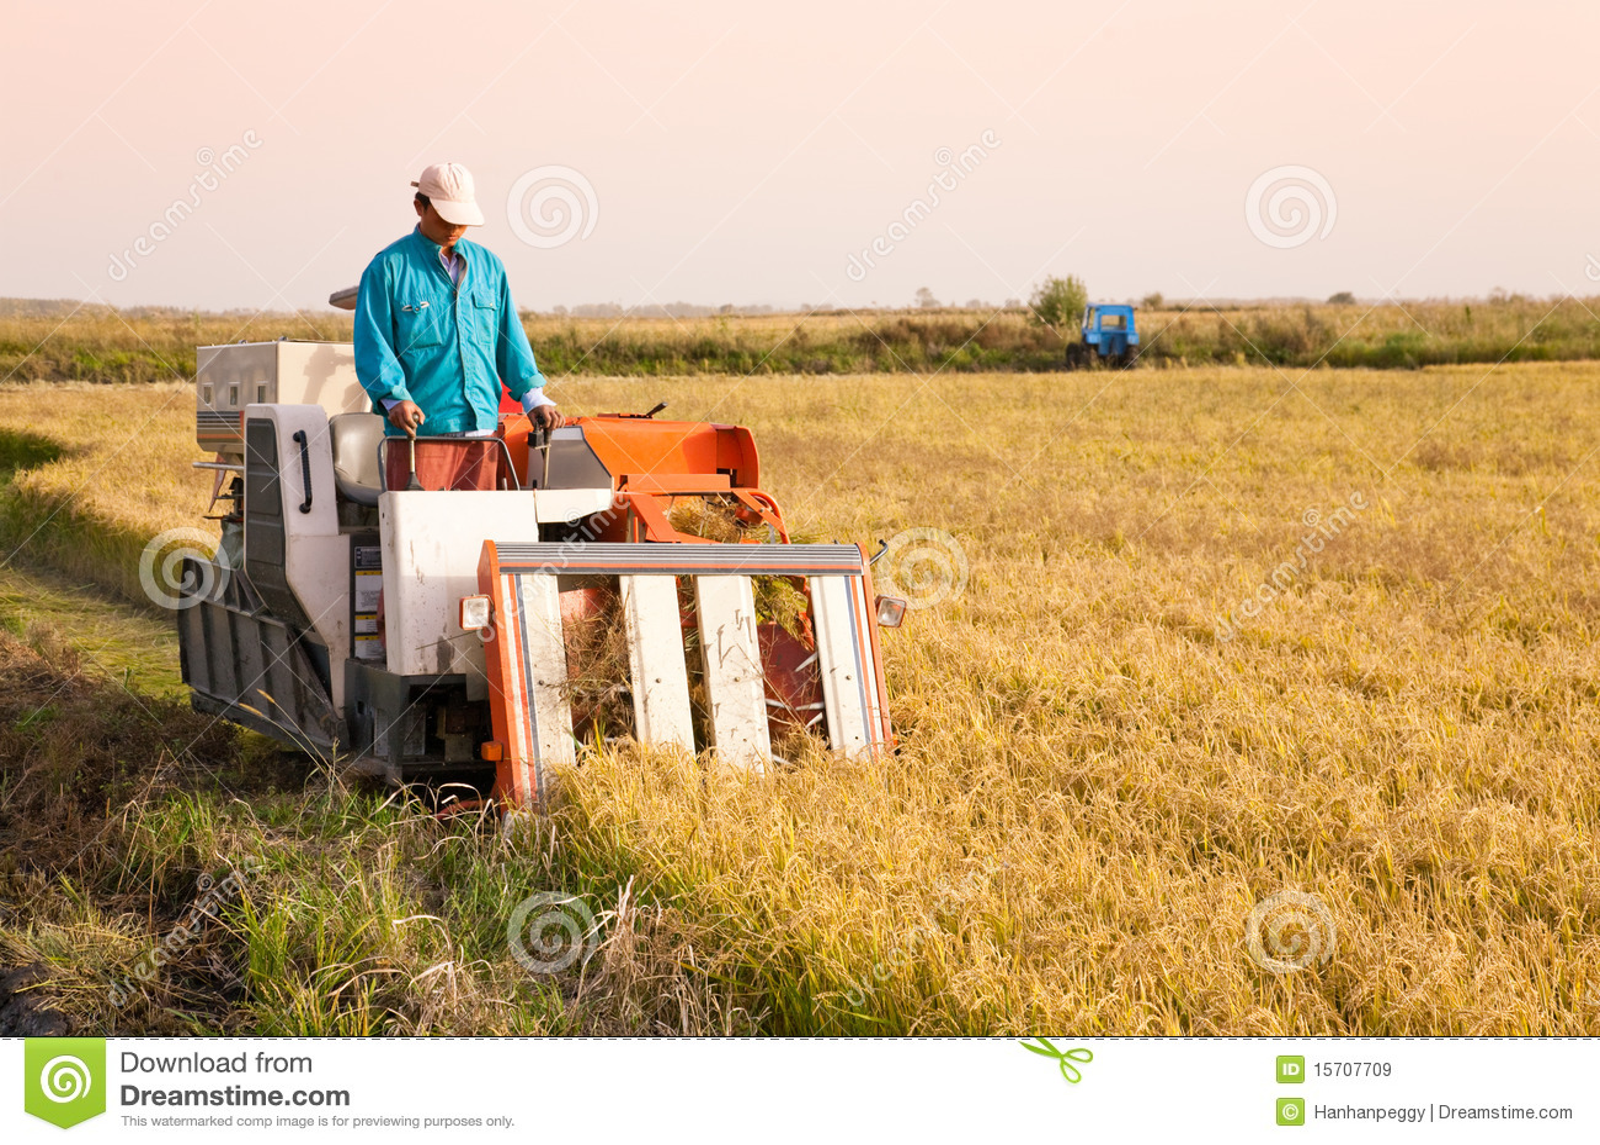 Farm worker harvesting rice